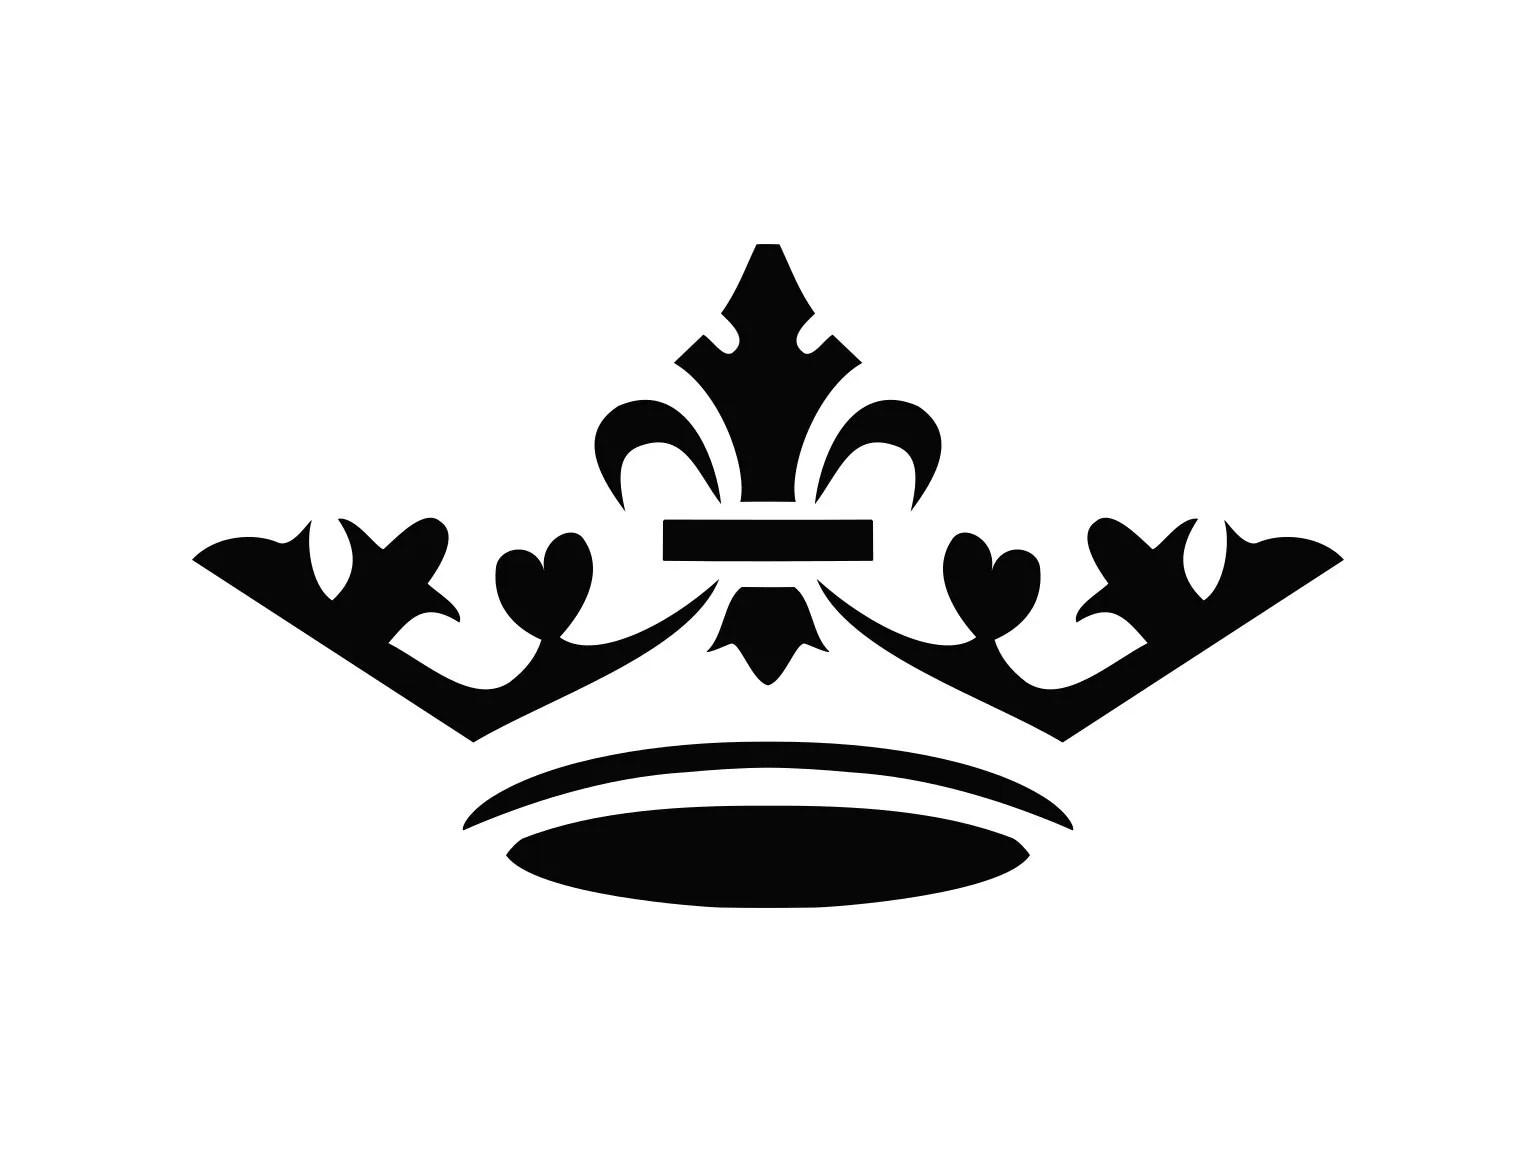 Crown Svg Princess Svg Princess Crown Svg Crown Clipart